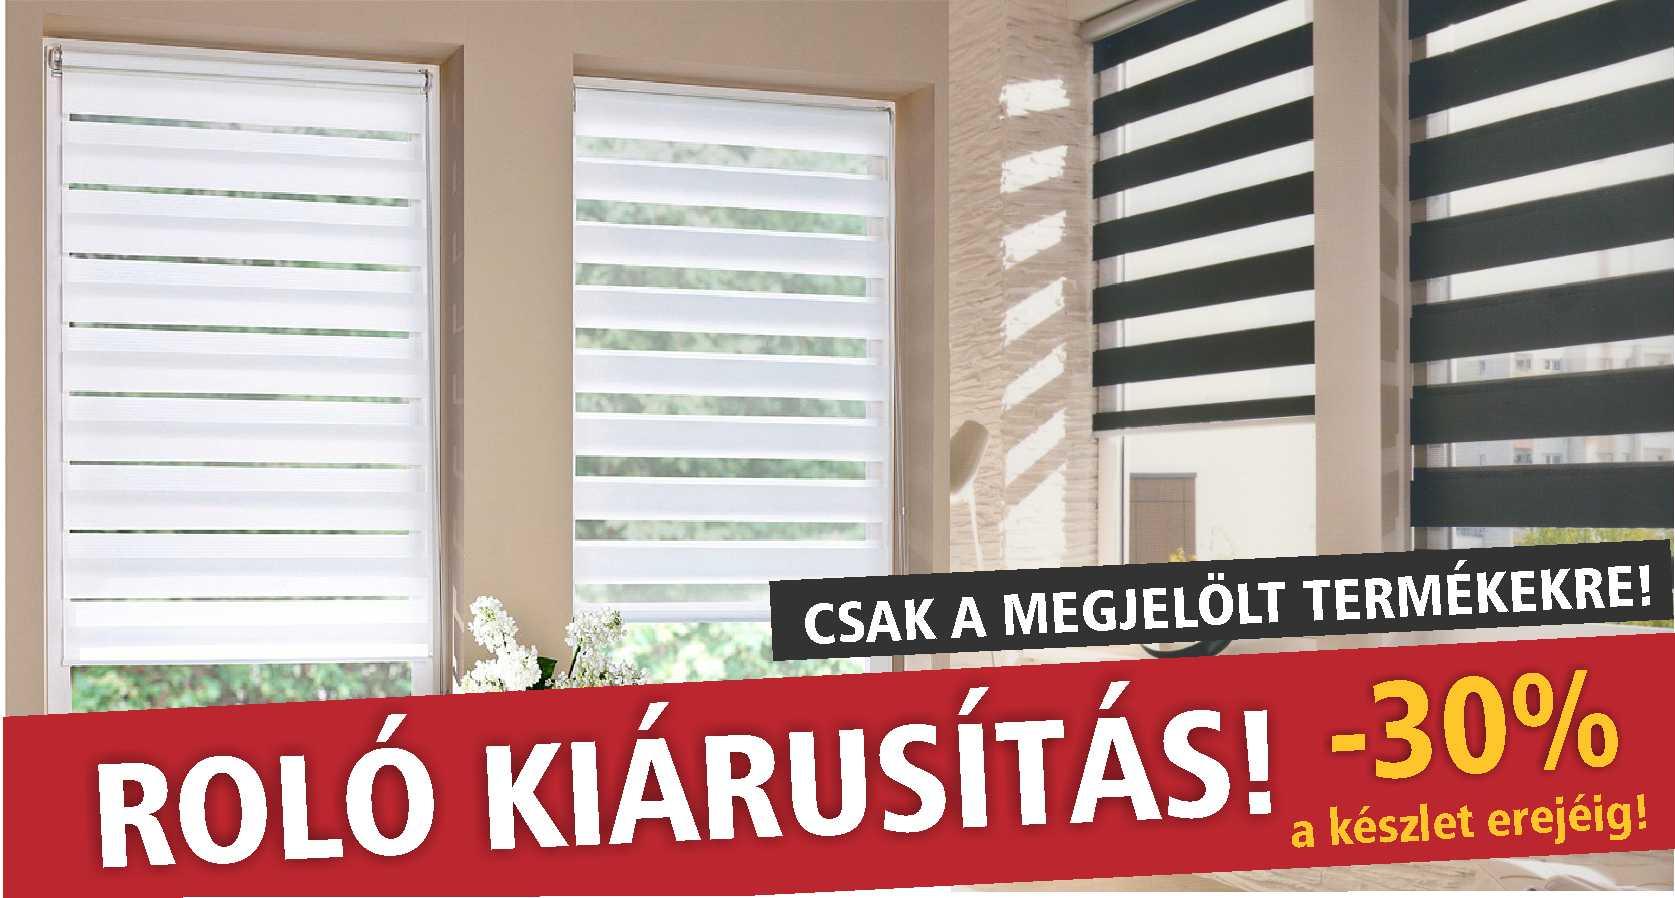 Roló kiárusítás - www.karnisstudio.hu